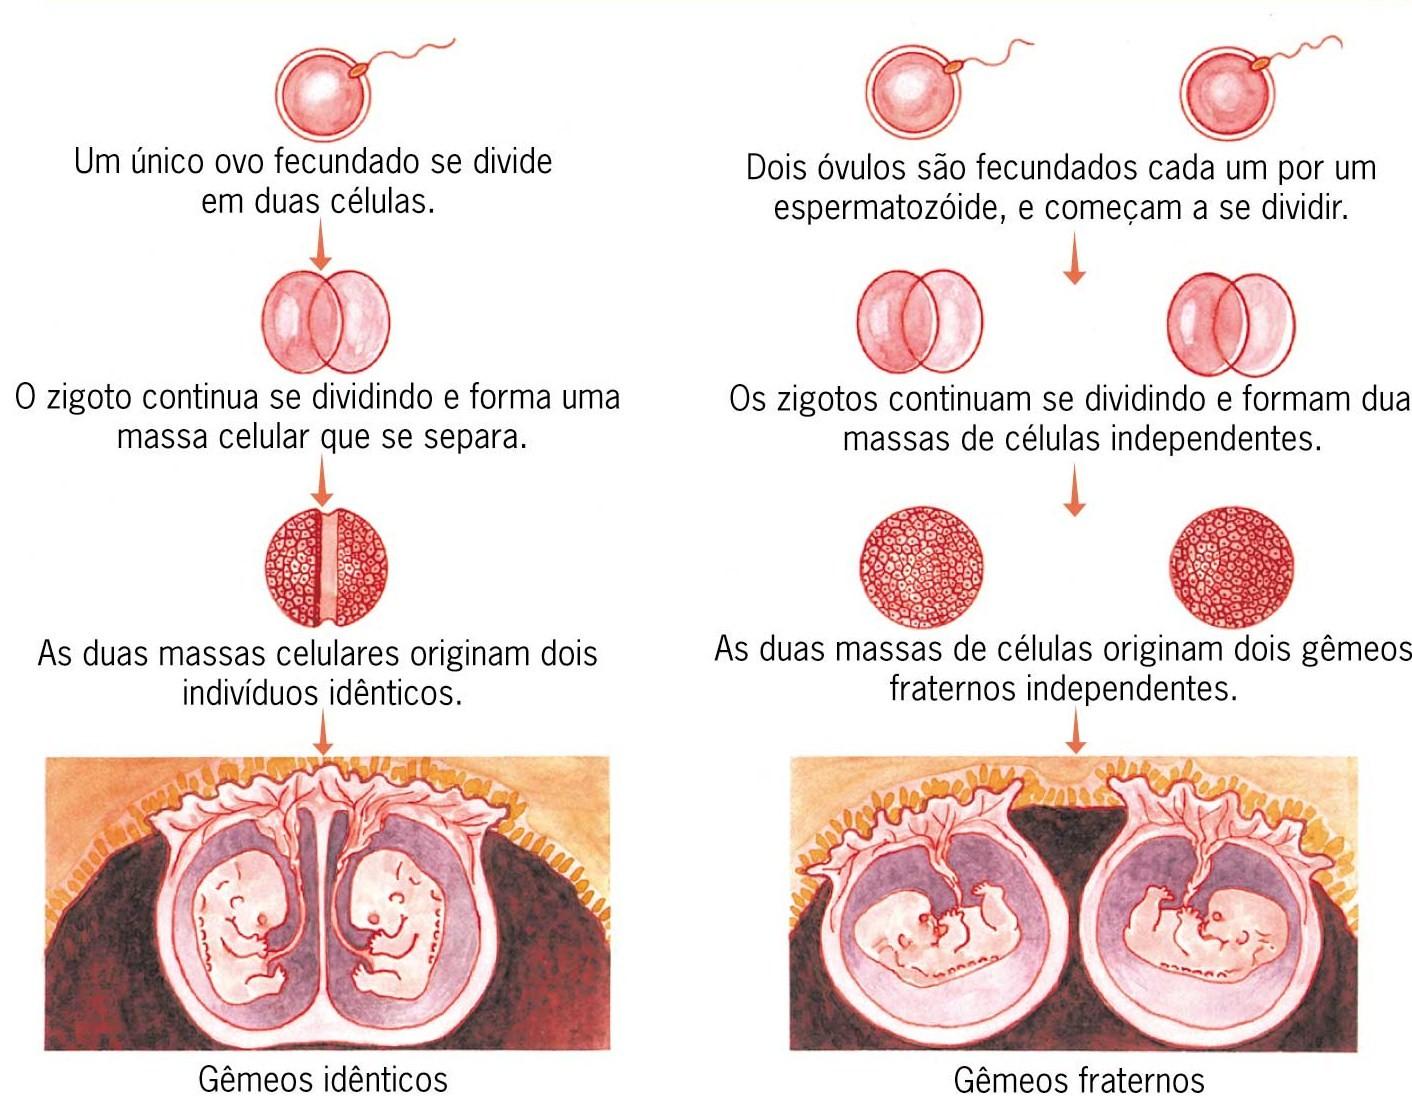 Genes e hereditariedade